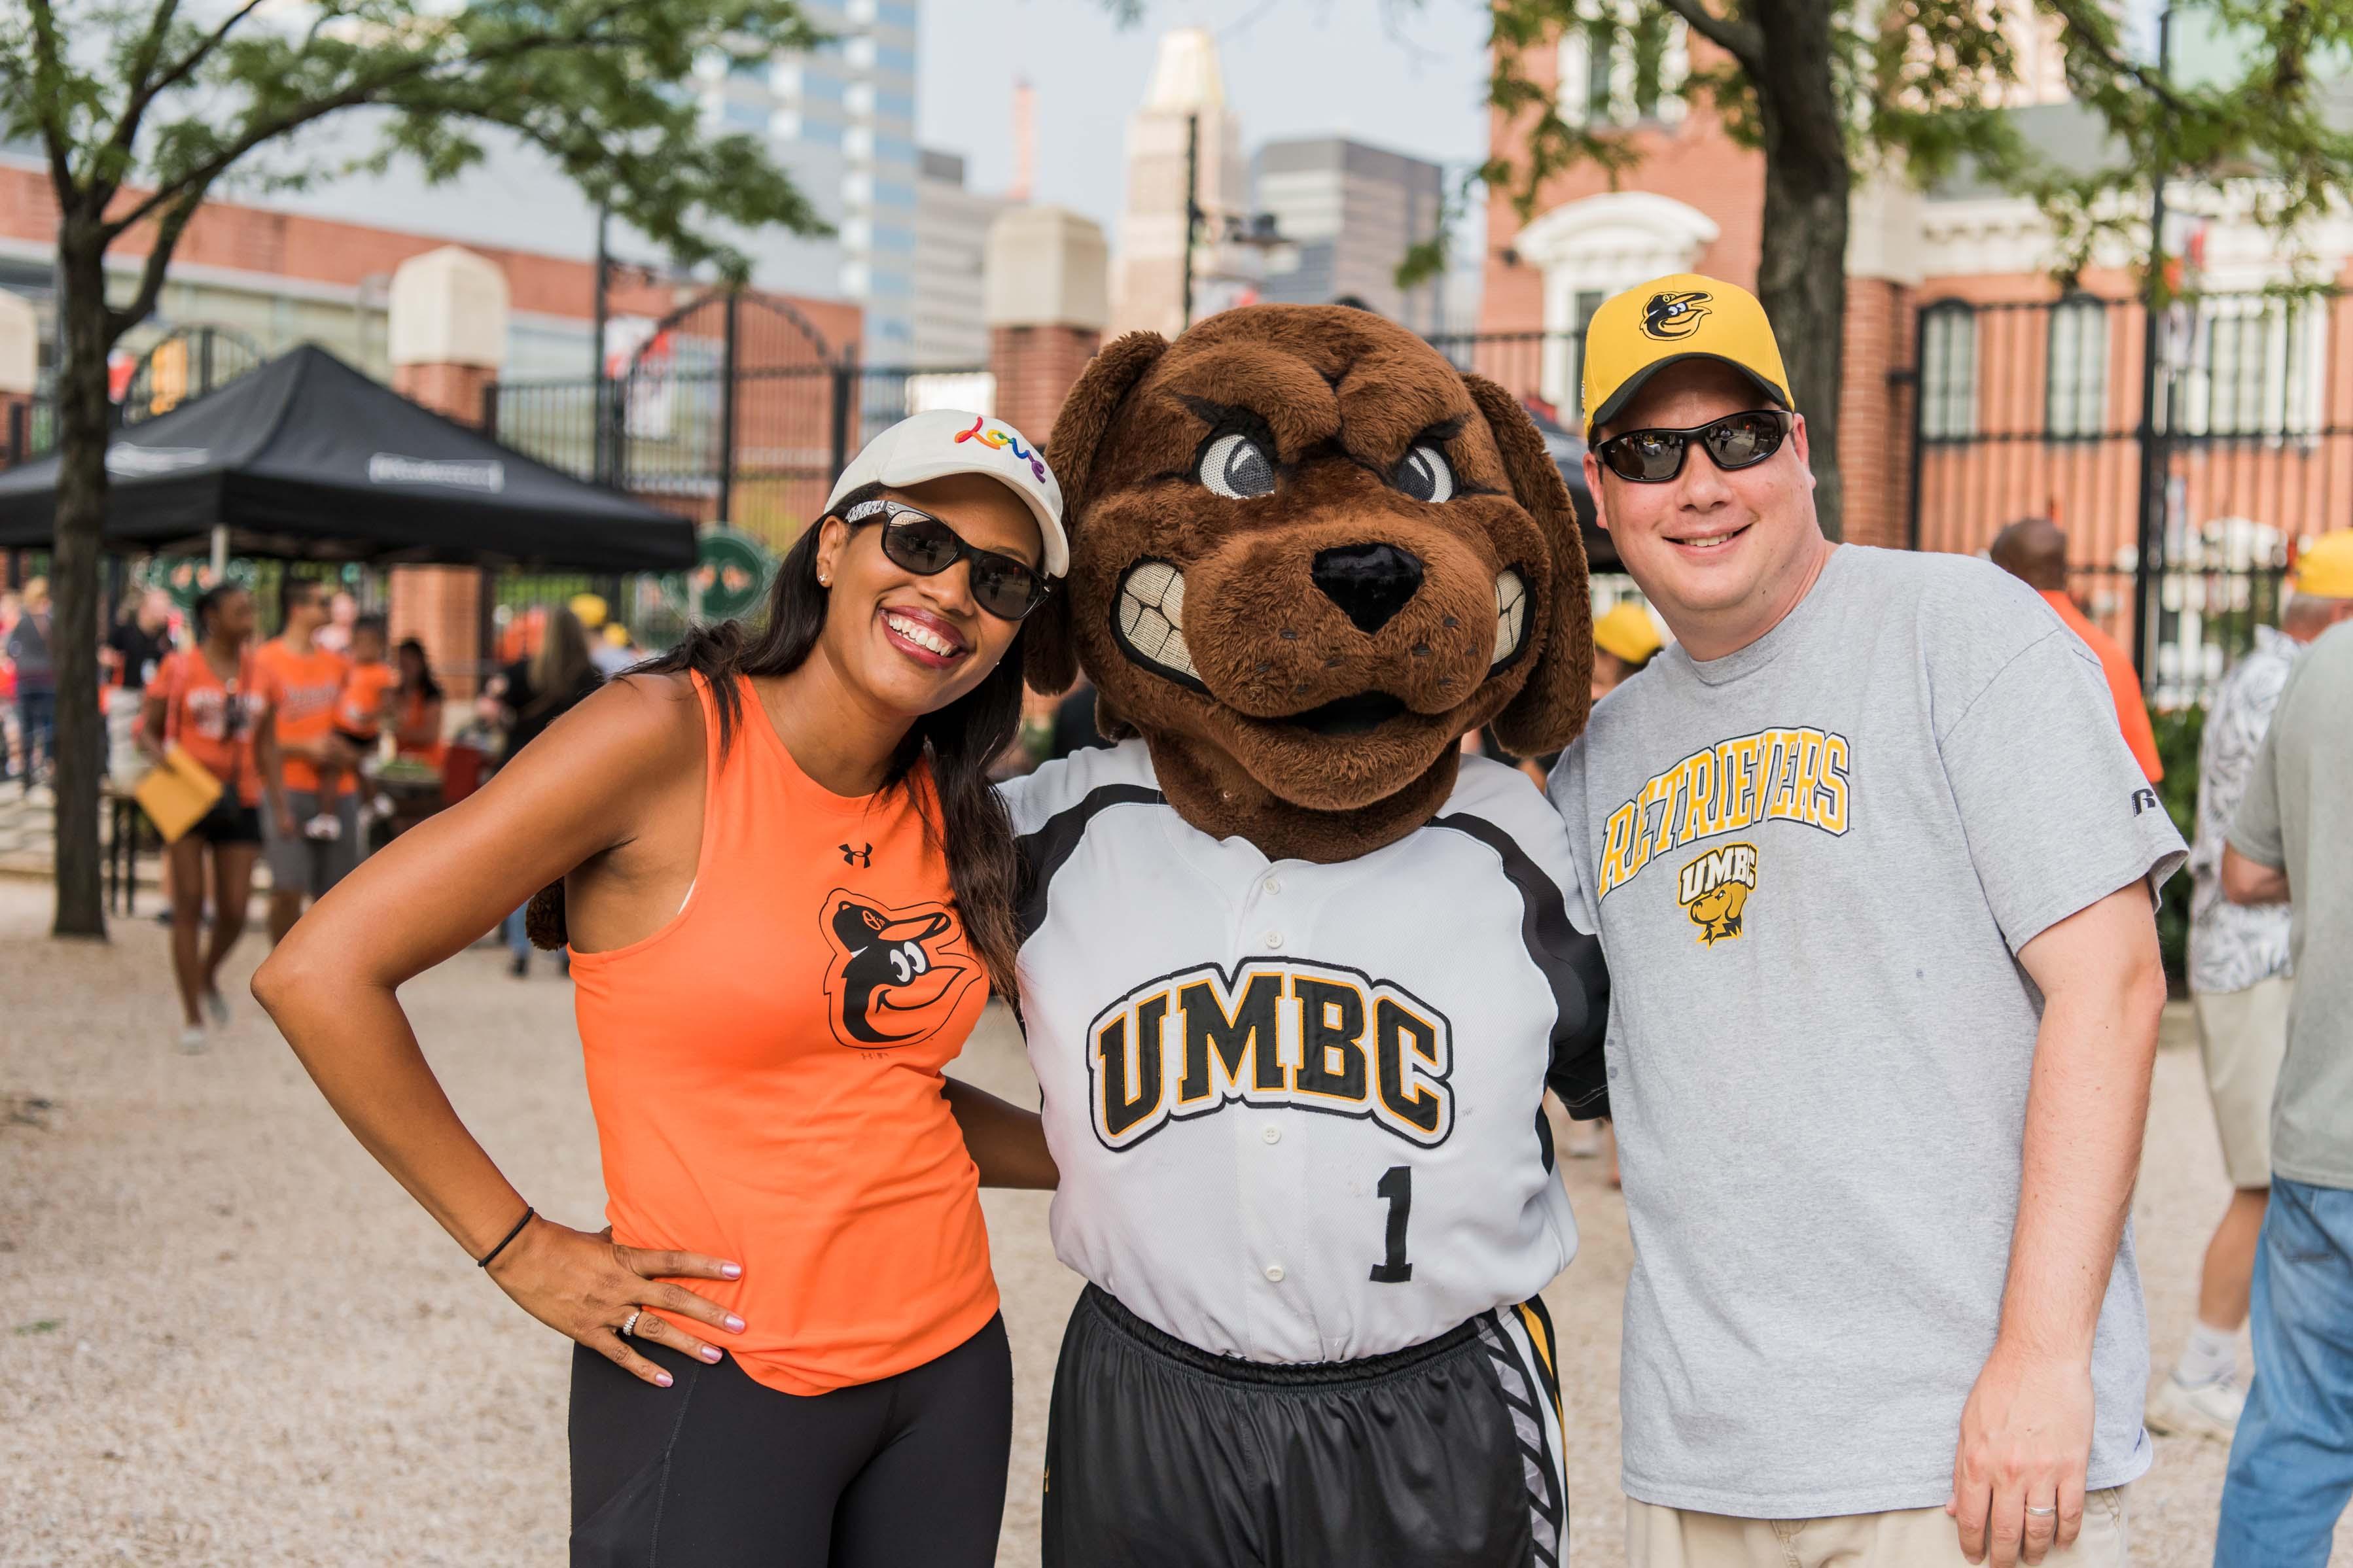 UMBC mascot posing with fans